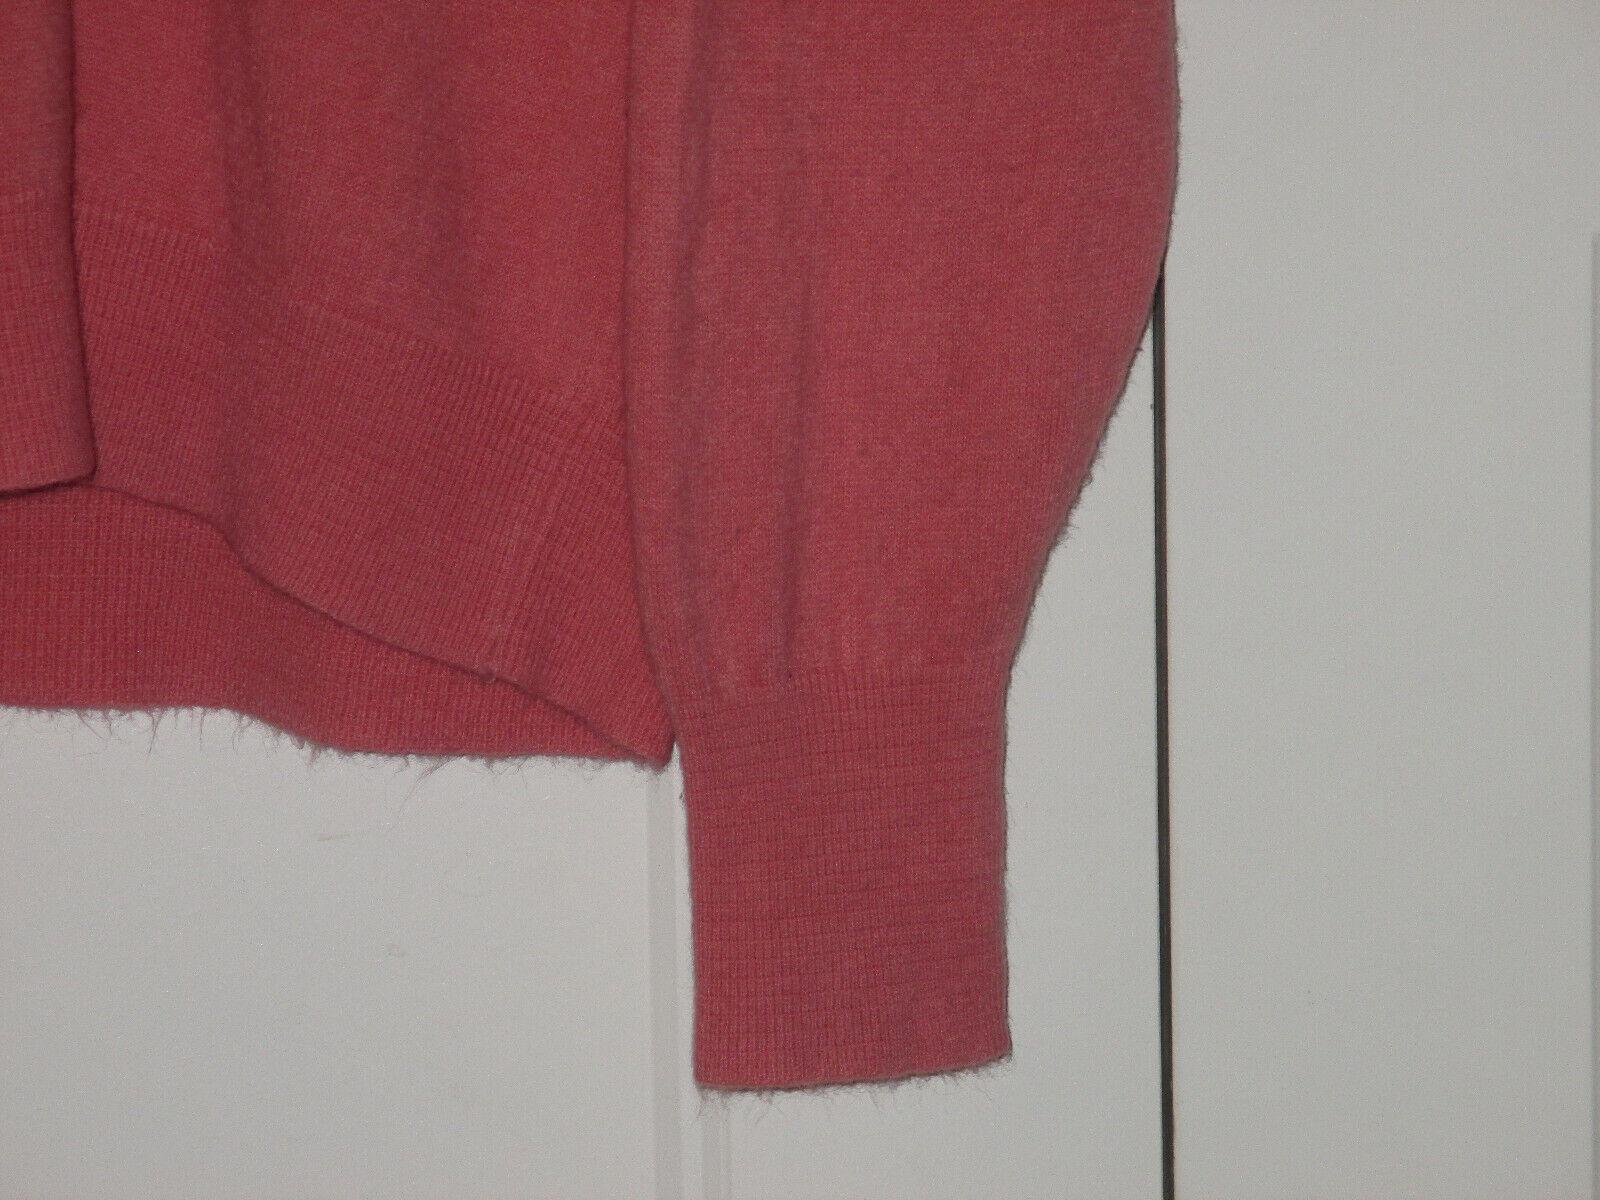 Rare Vintage 1980s Christian Dior Logo Sweater  - image 5